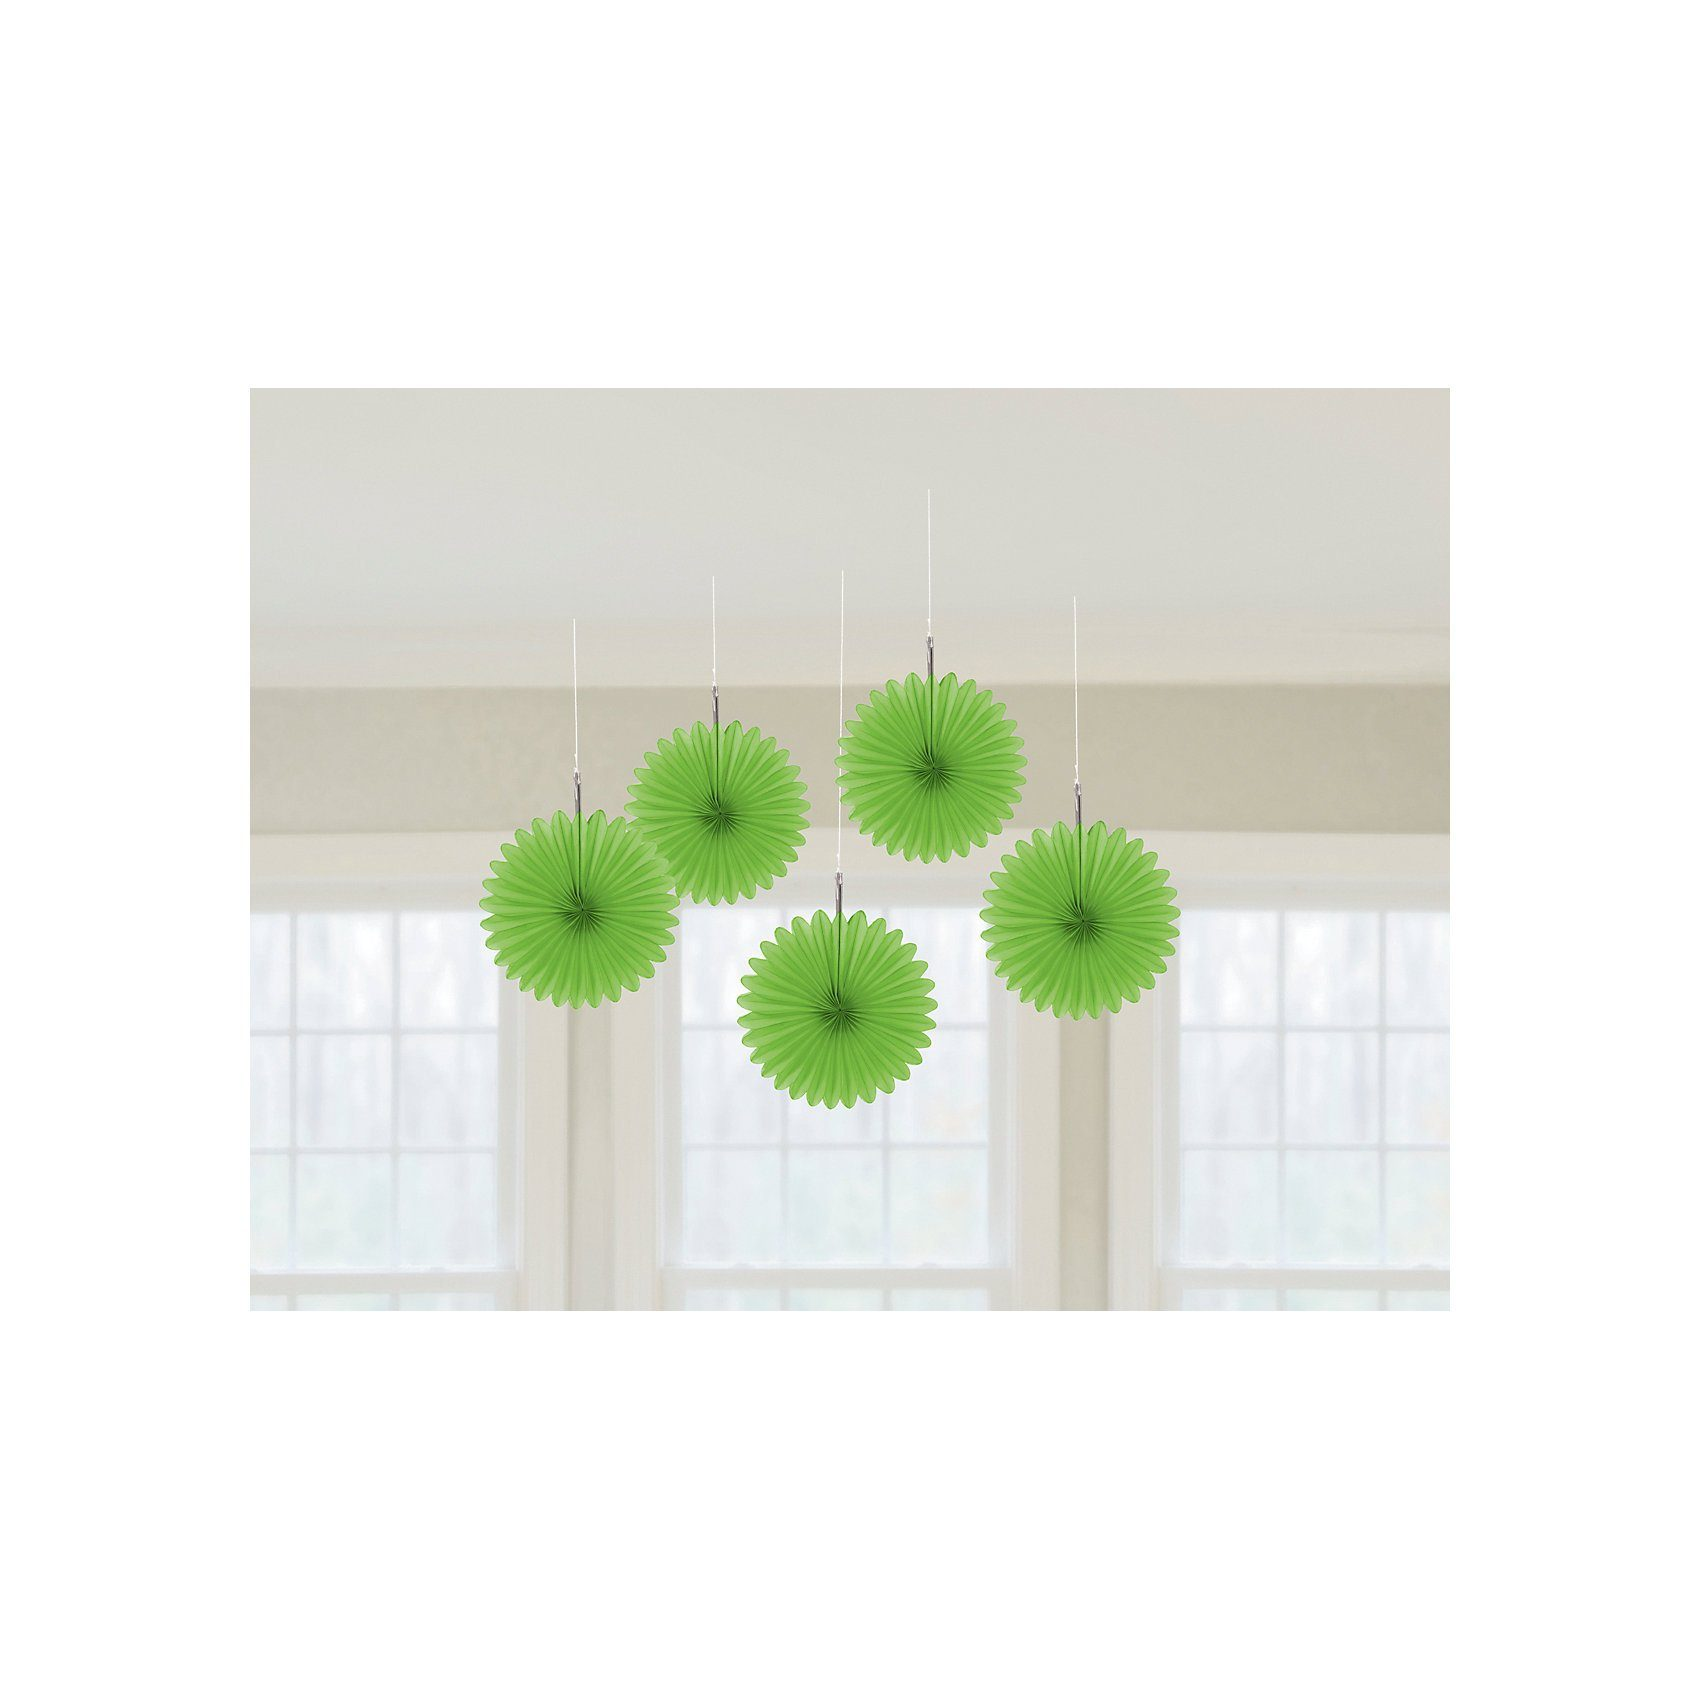 Amscan Deko-Fächer grün, 5 Stück